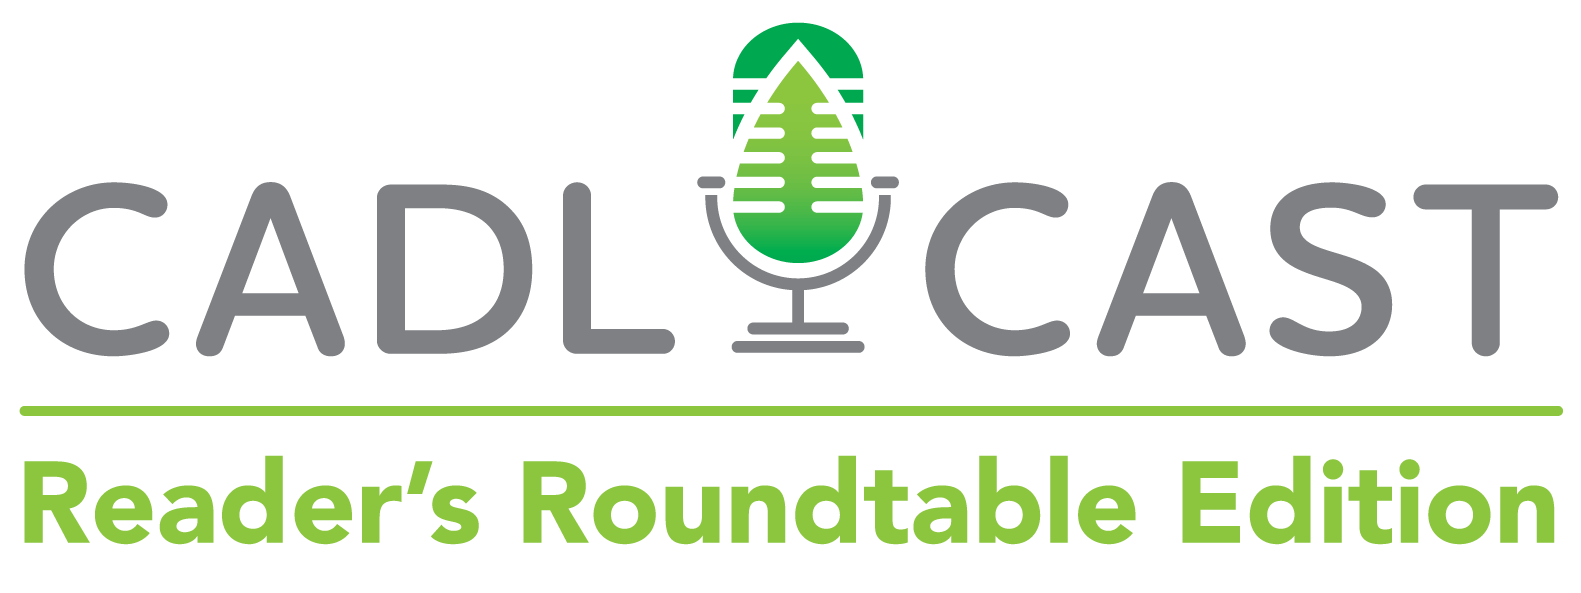 CADLcast Reader's Roundtable Edition Logo